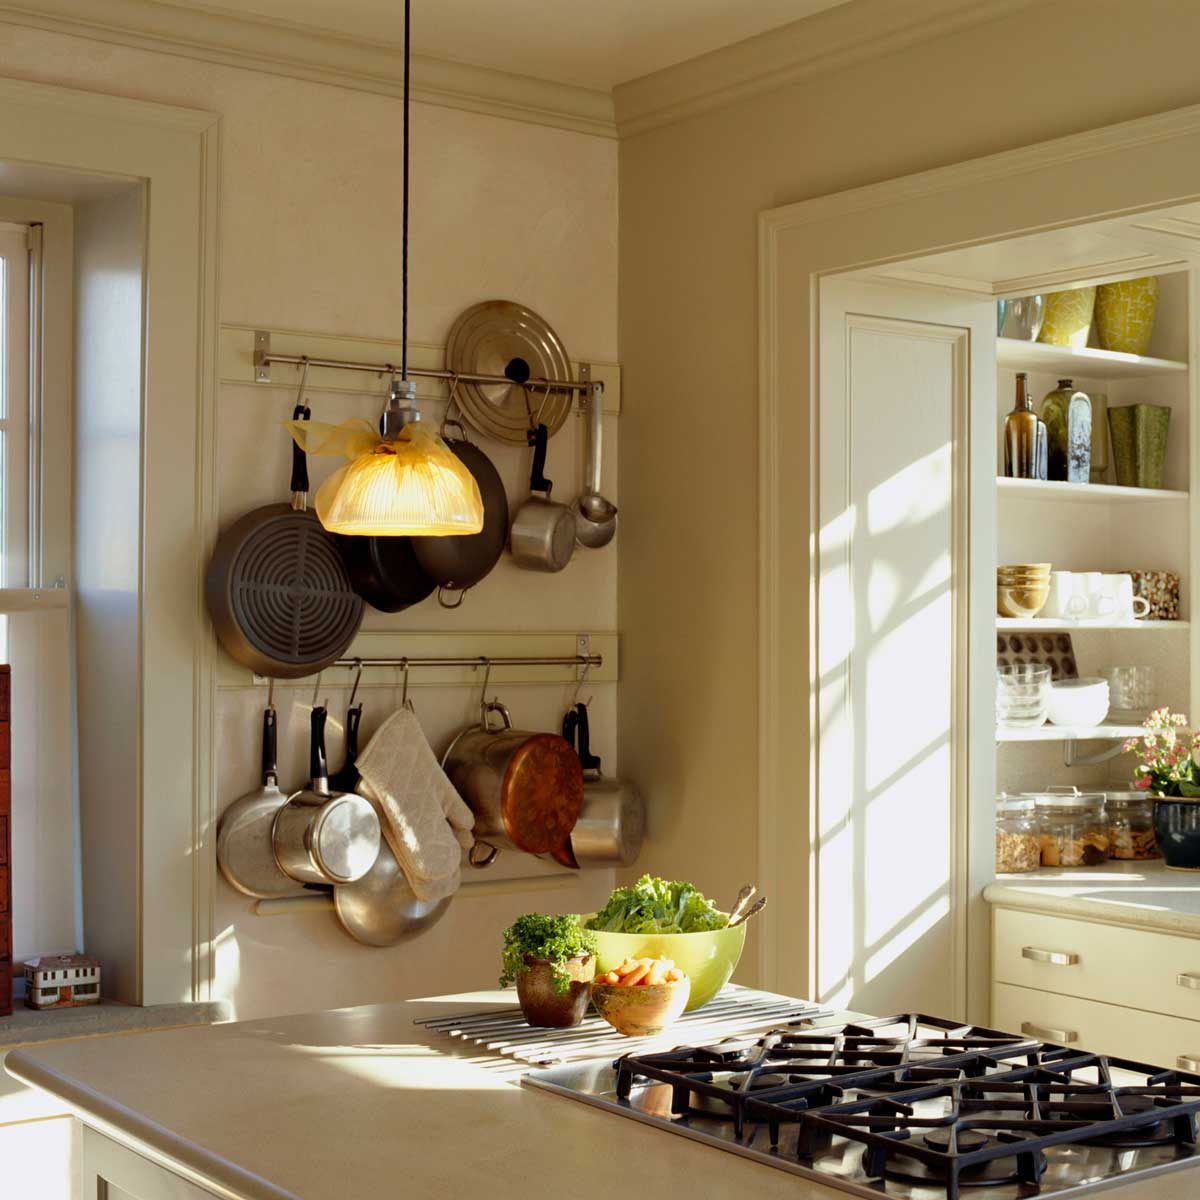 Kitchen Pot Rack Gettyimages 98196801